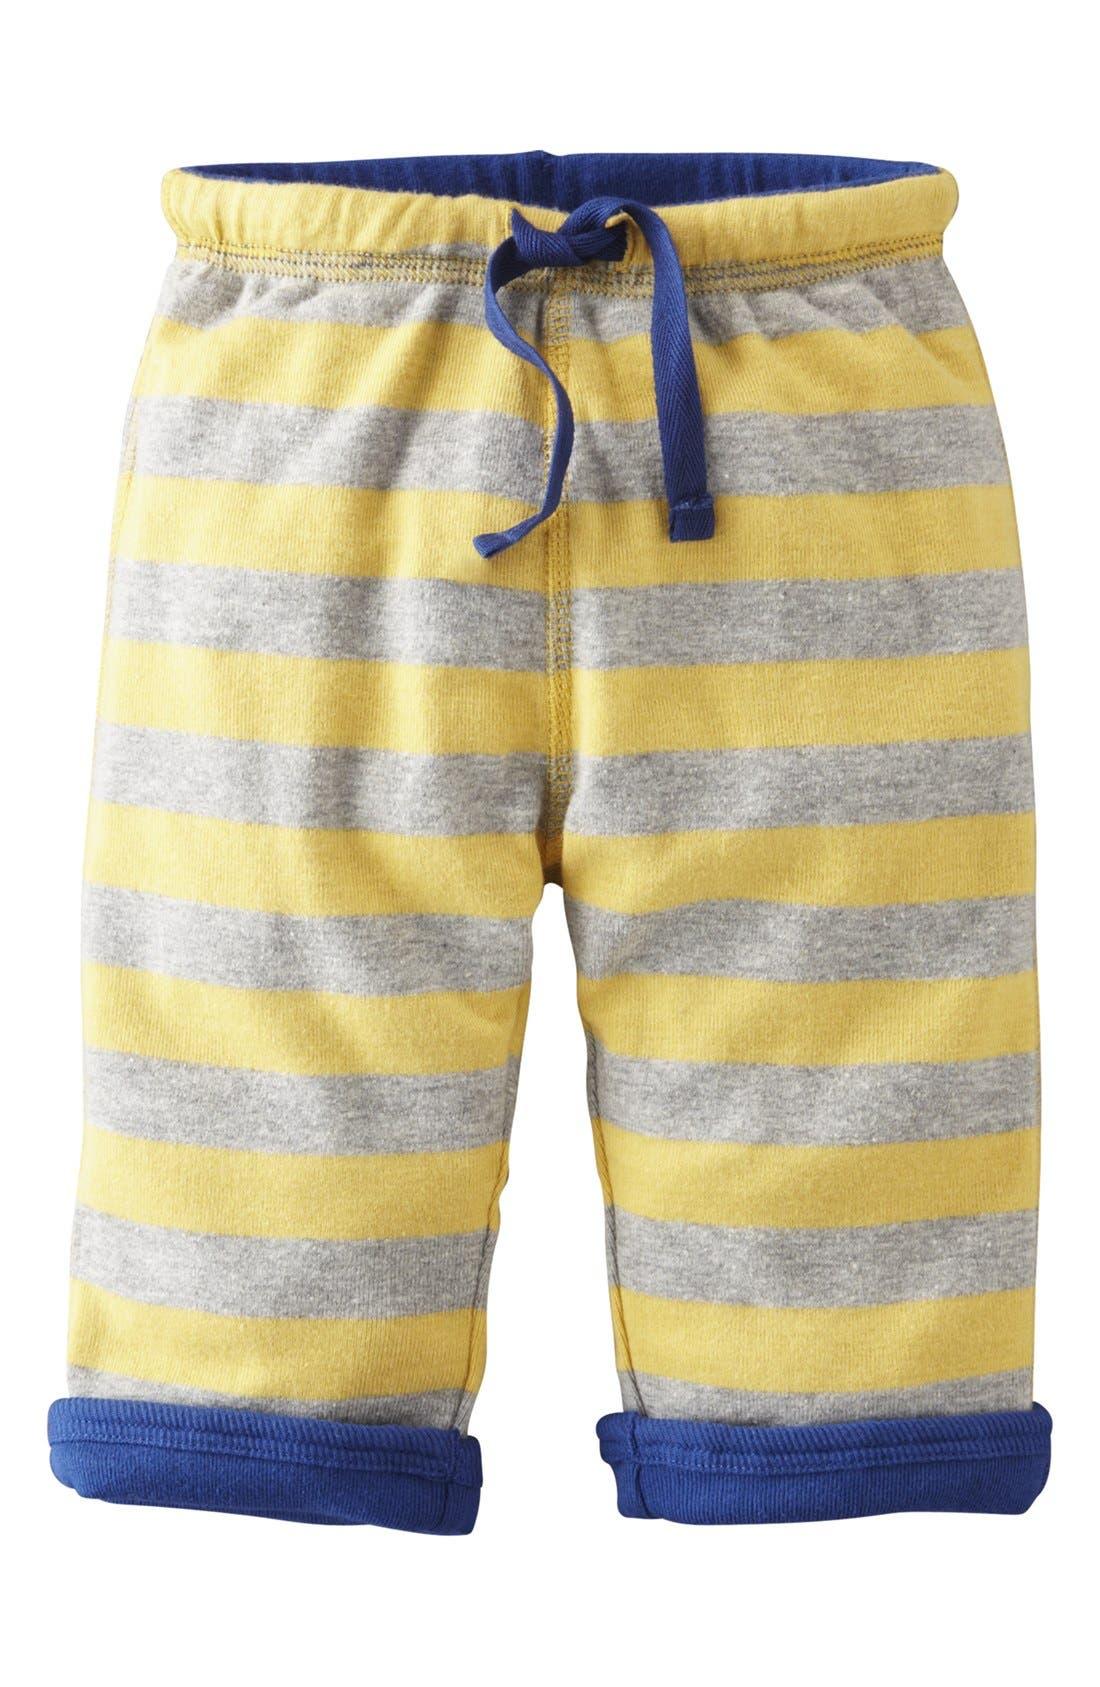 Alternate Image 1 Selected - Mini Boden 'Baggies' Reversible Jersey Pants (Baby Boys)